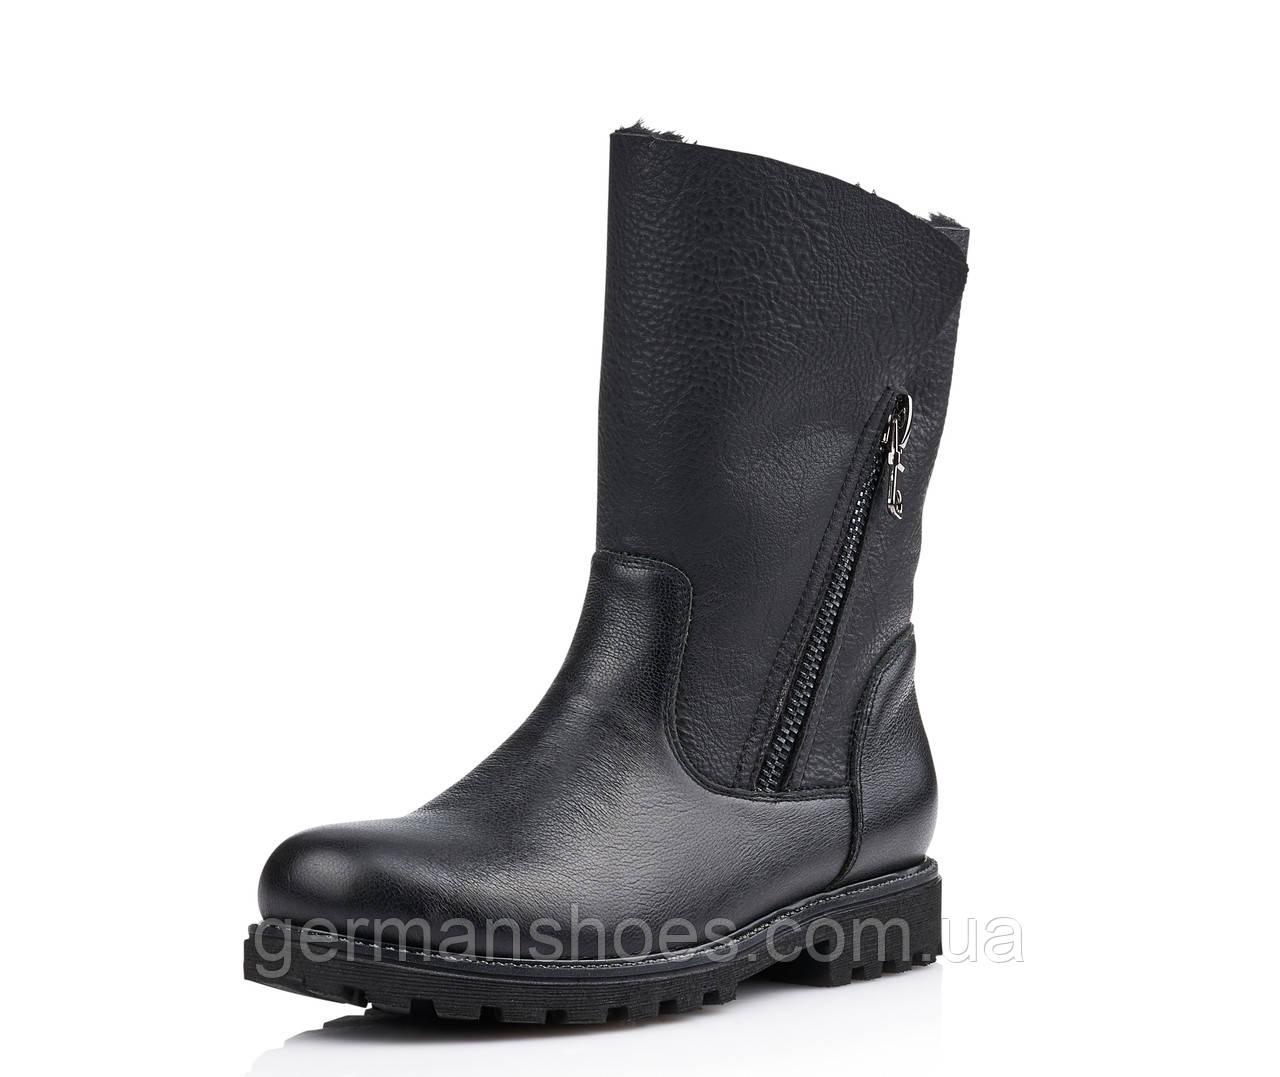 Ботинки женские Remonte D7496-01